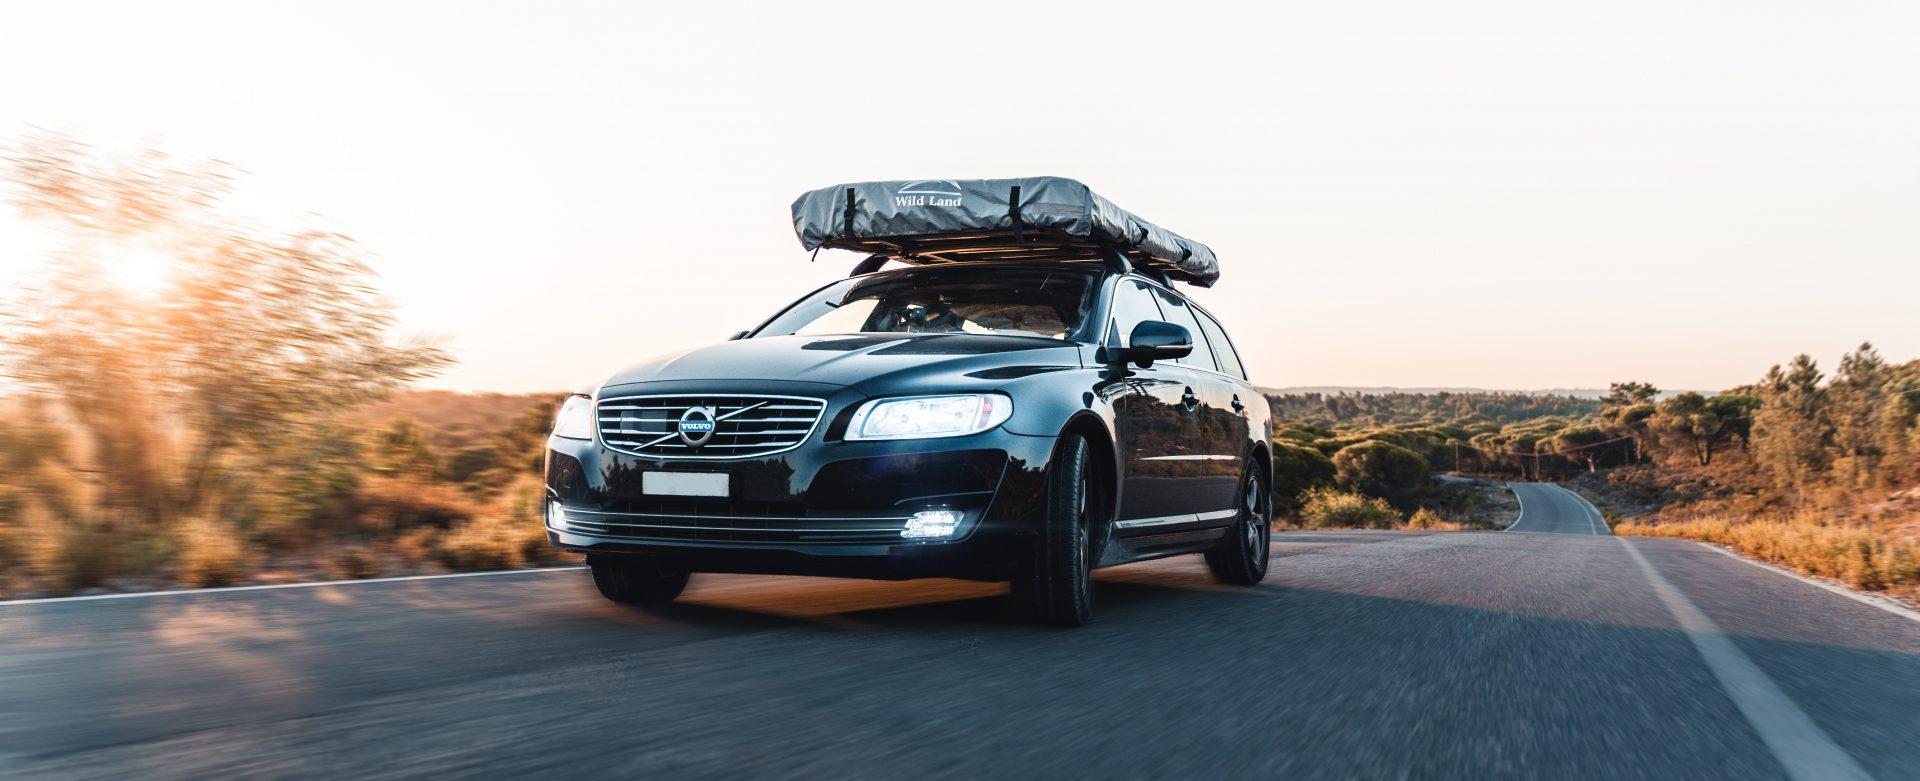 Volvo in Fahrt – Kopie